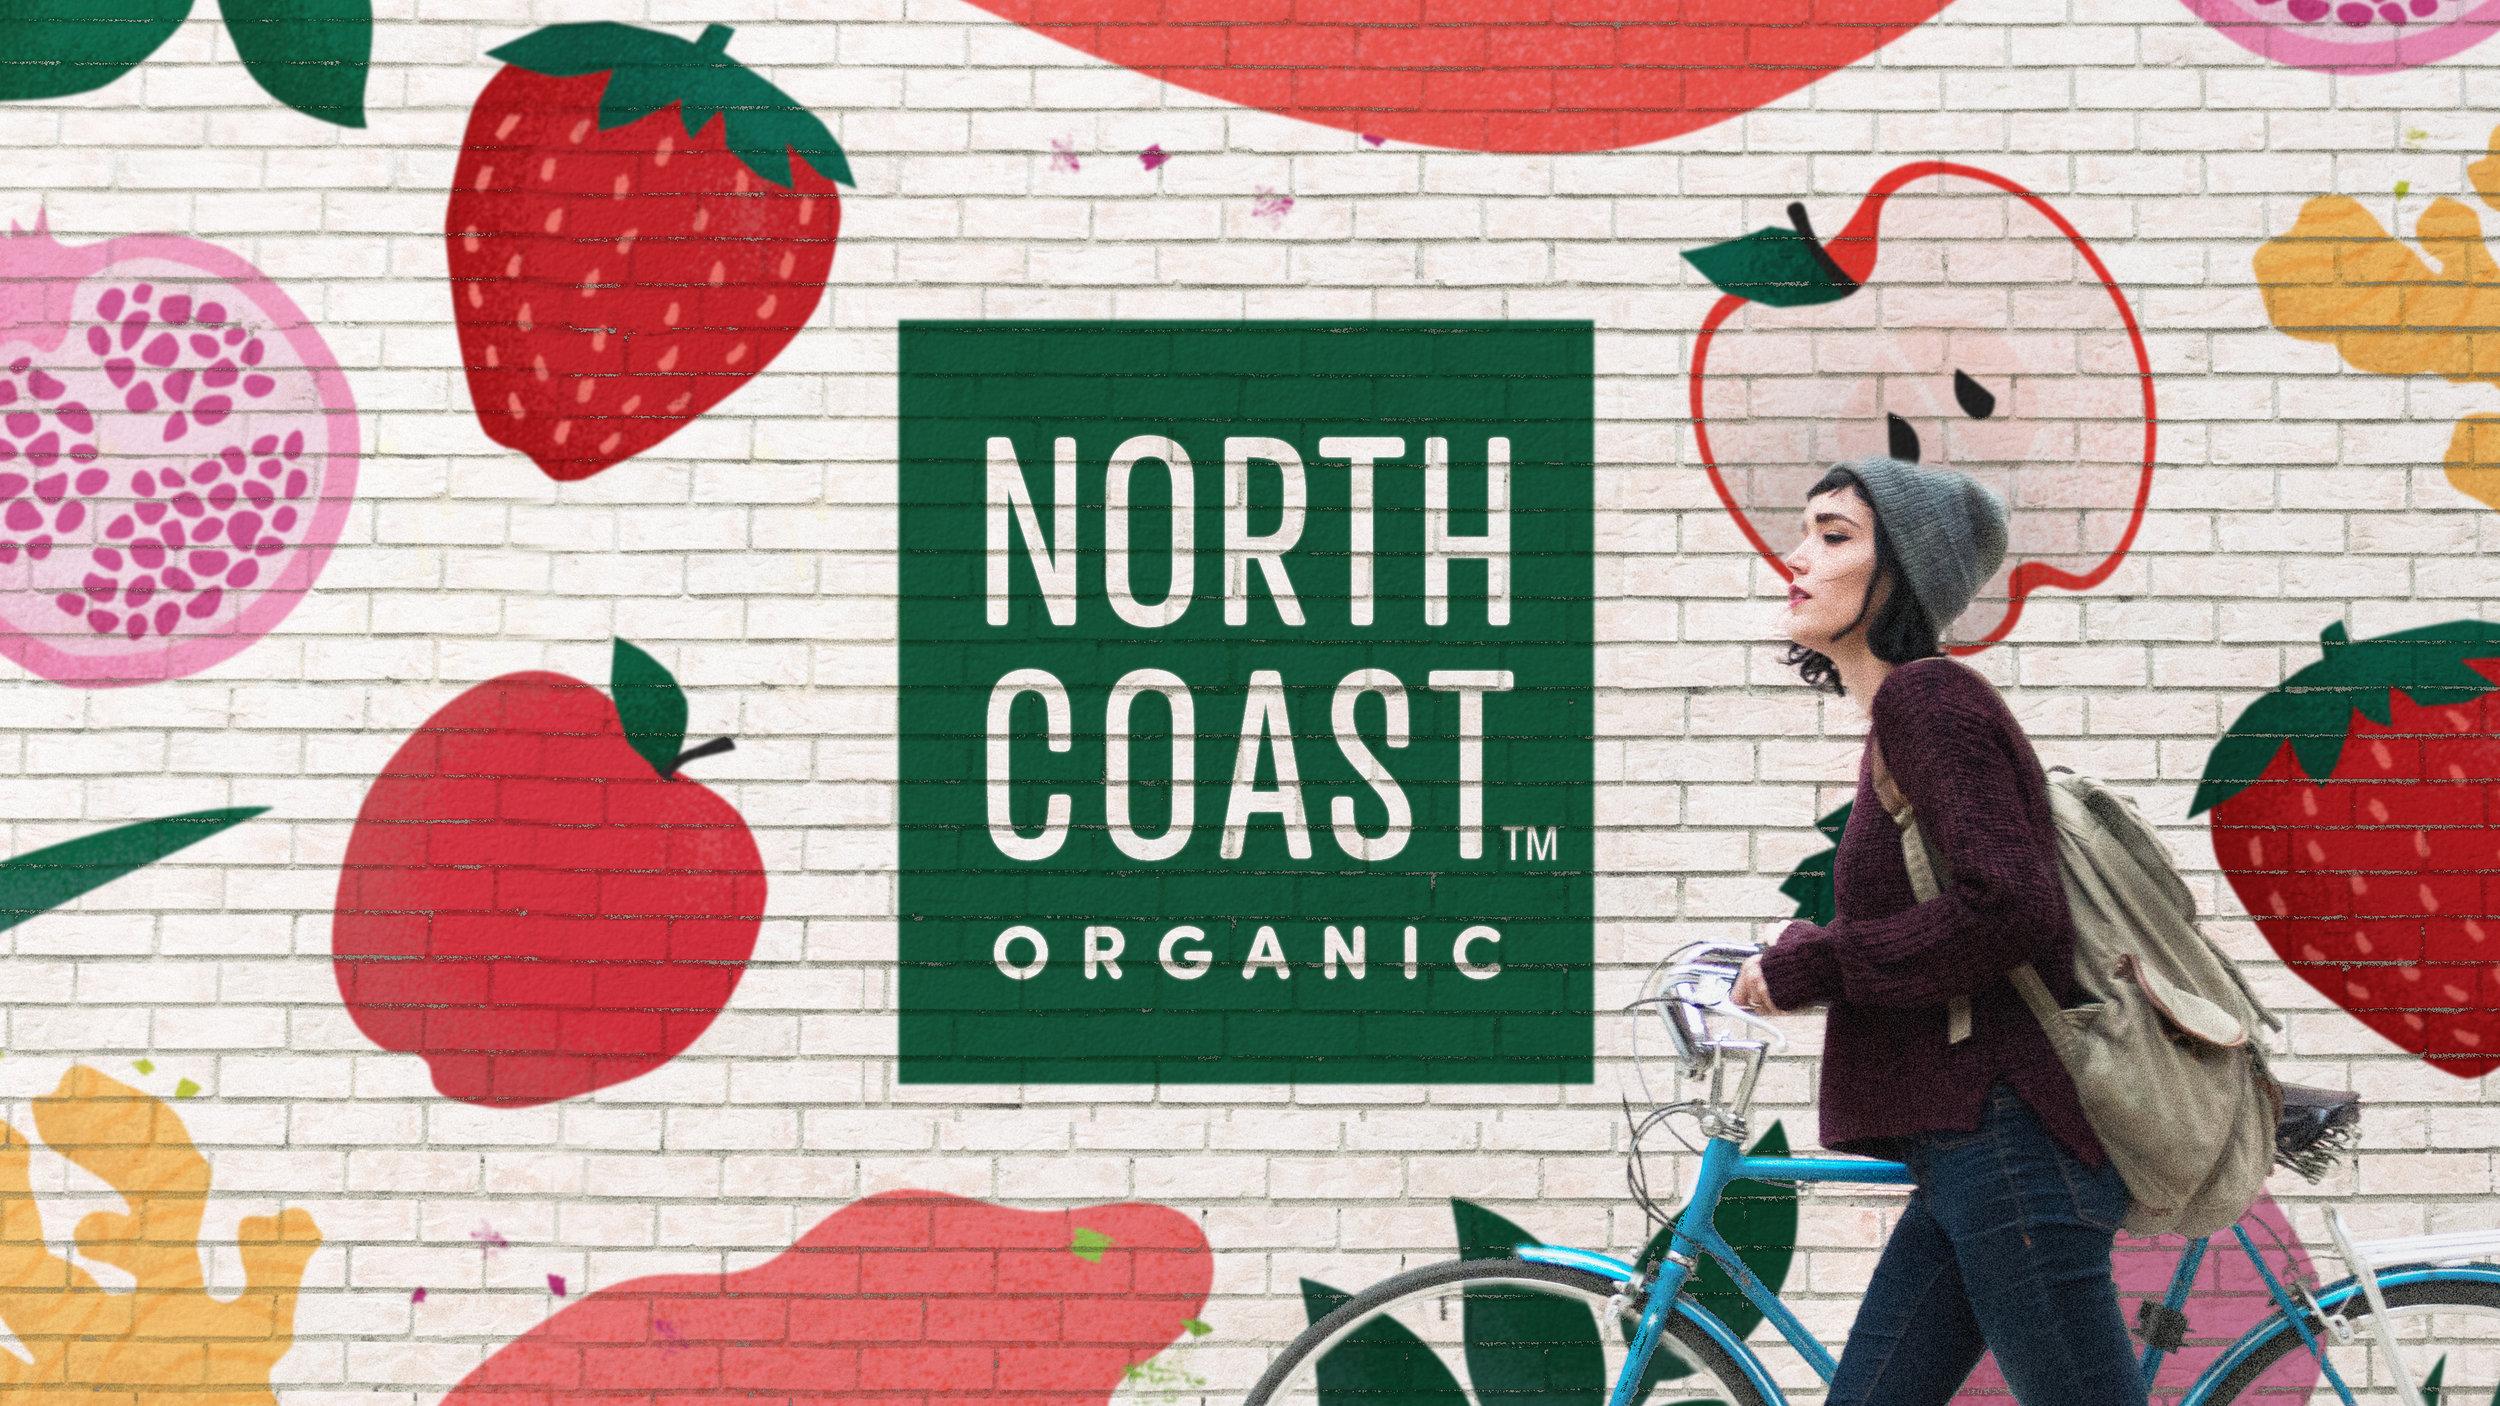 NorthCoast_Web_WallGraphic_v3.jpg